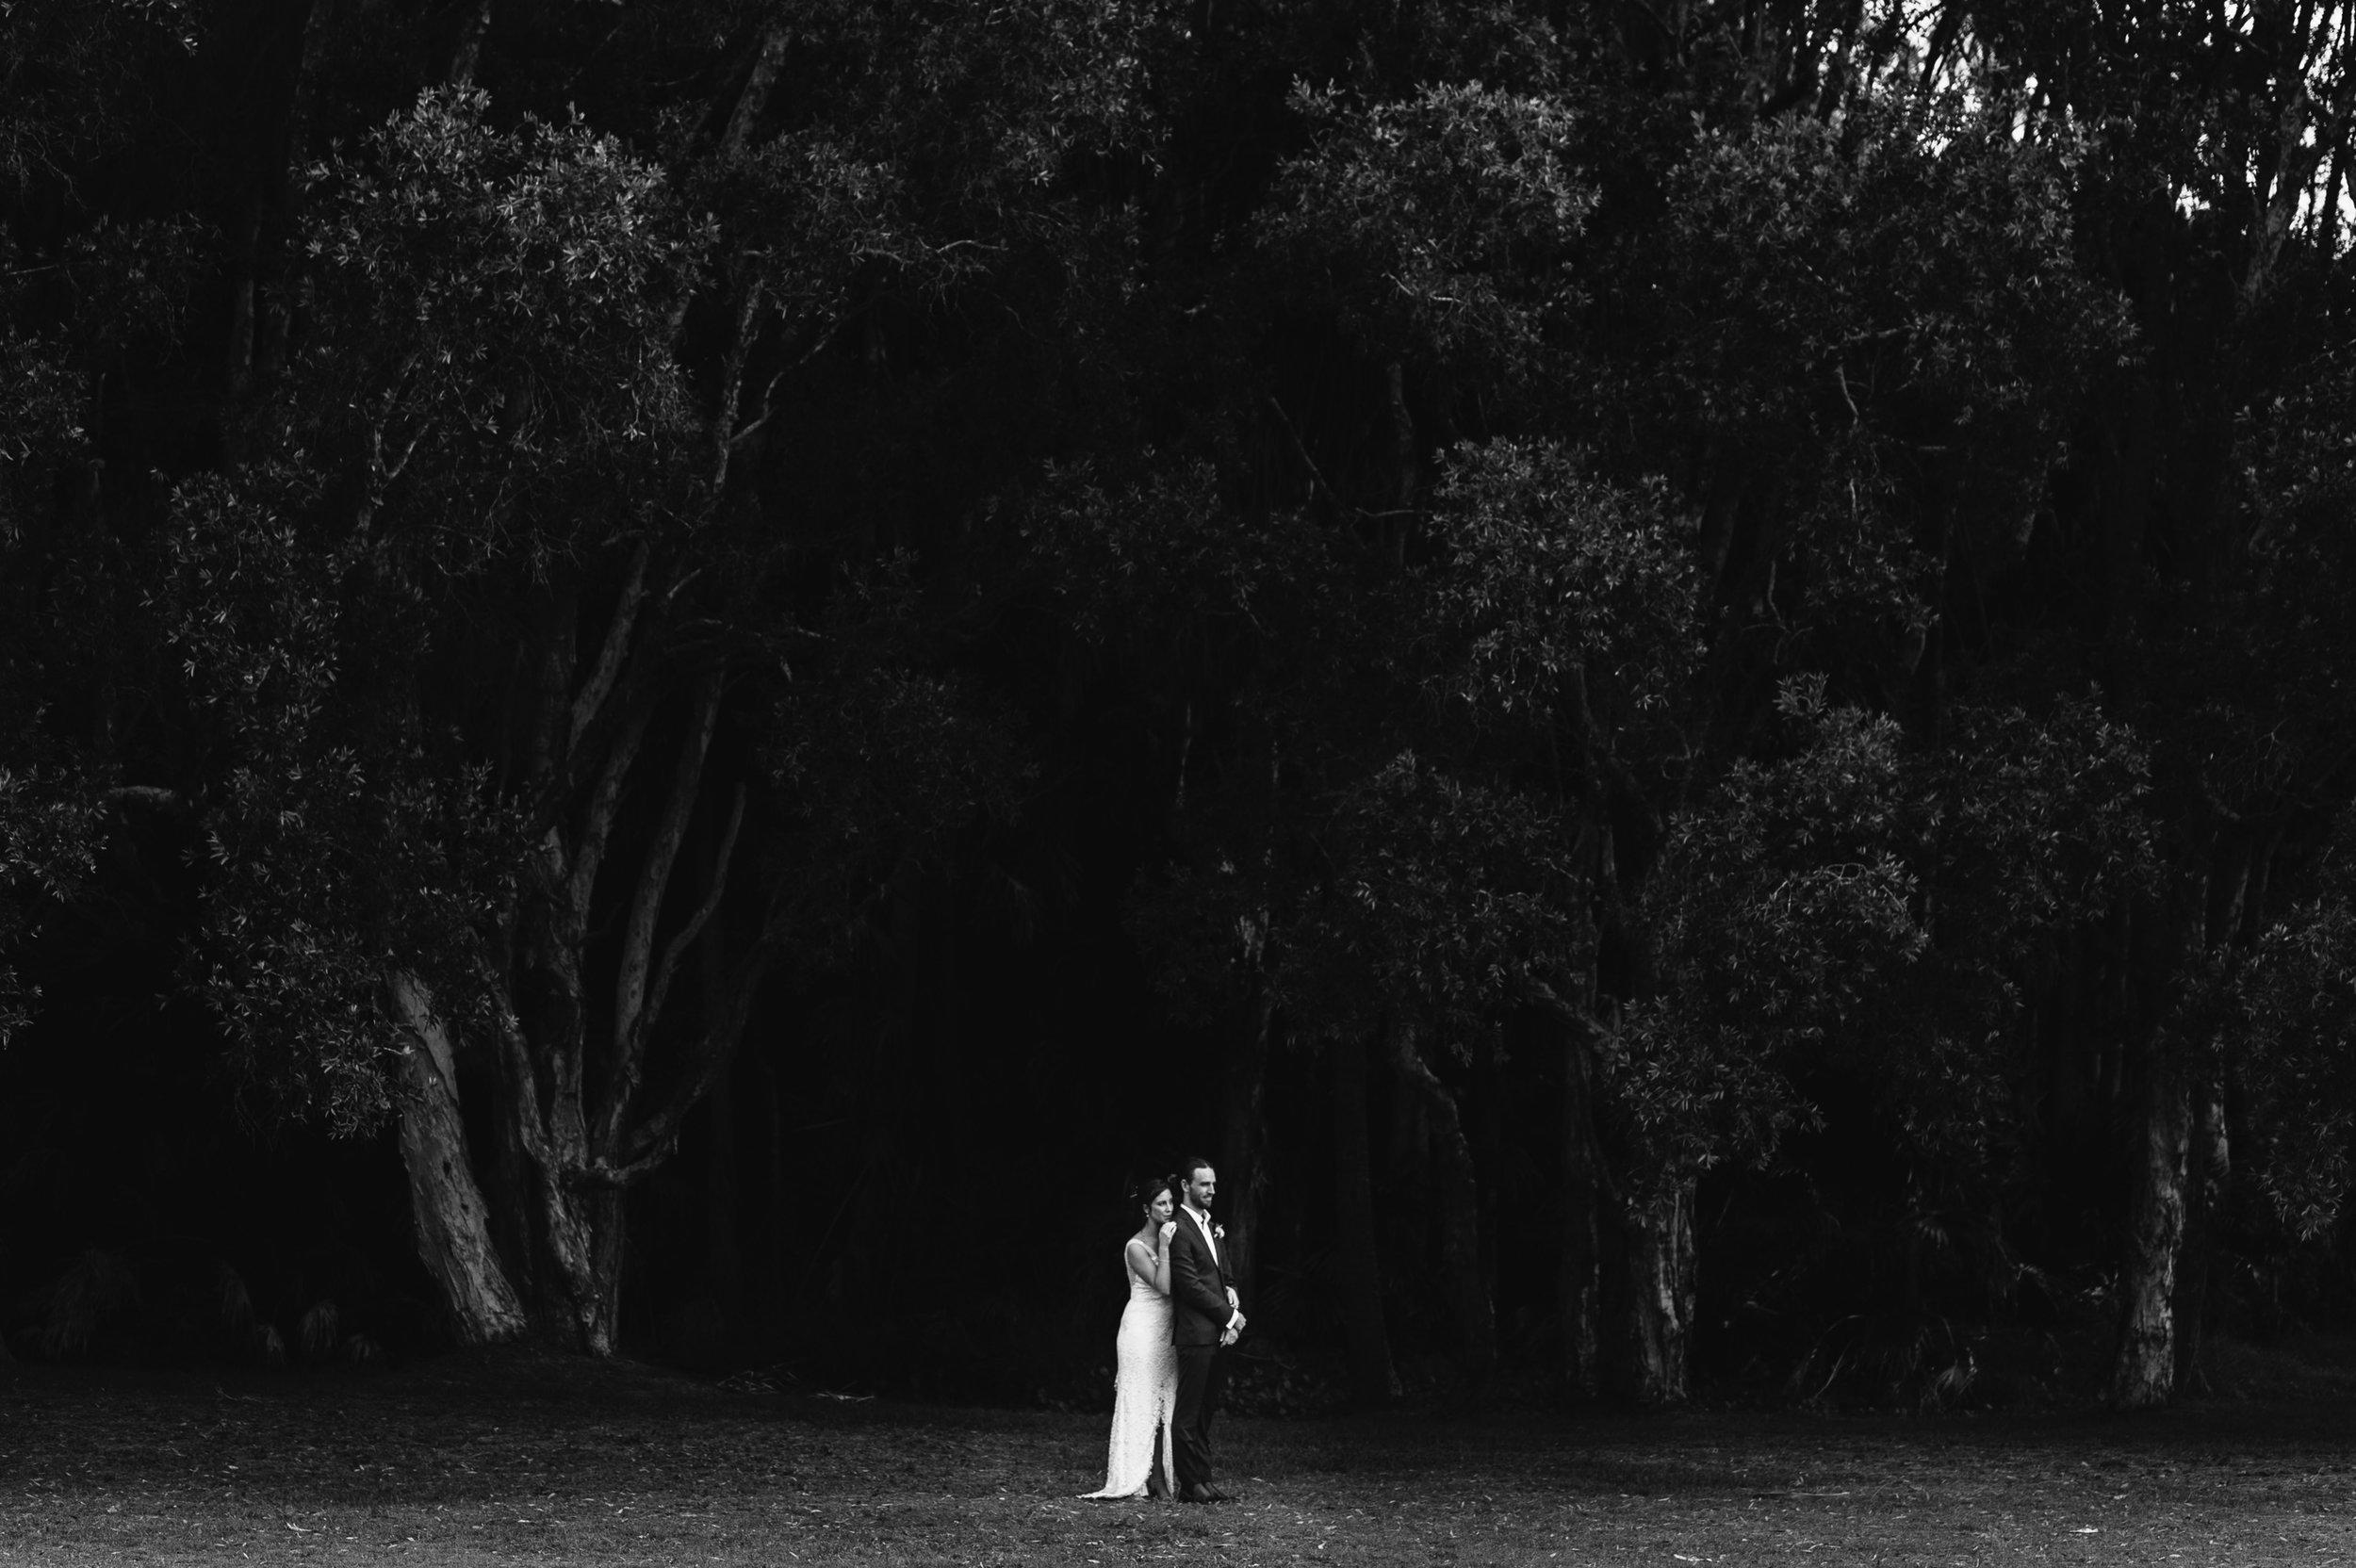 weddings+by+atelier+photography-wedding-29.jpg